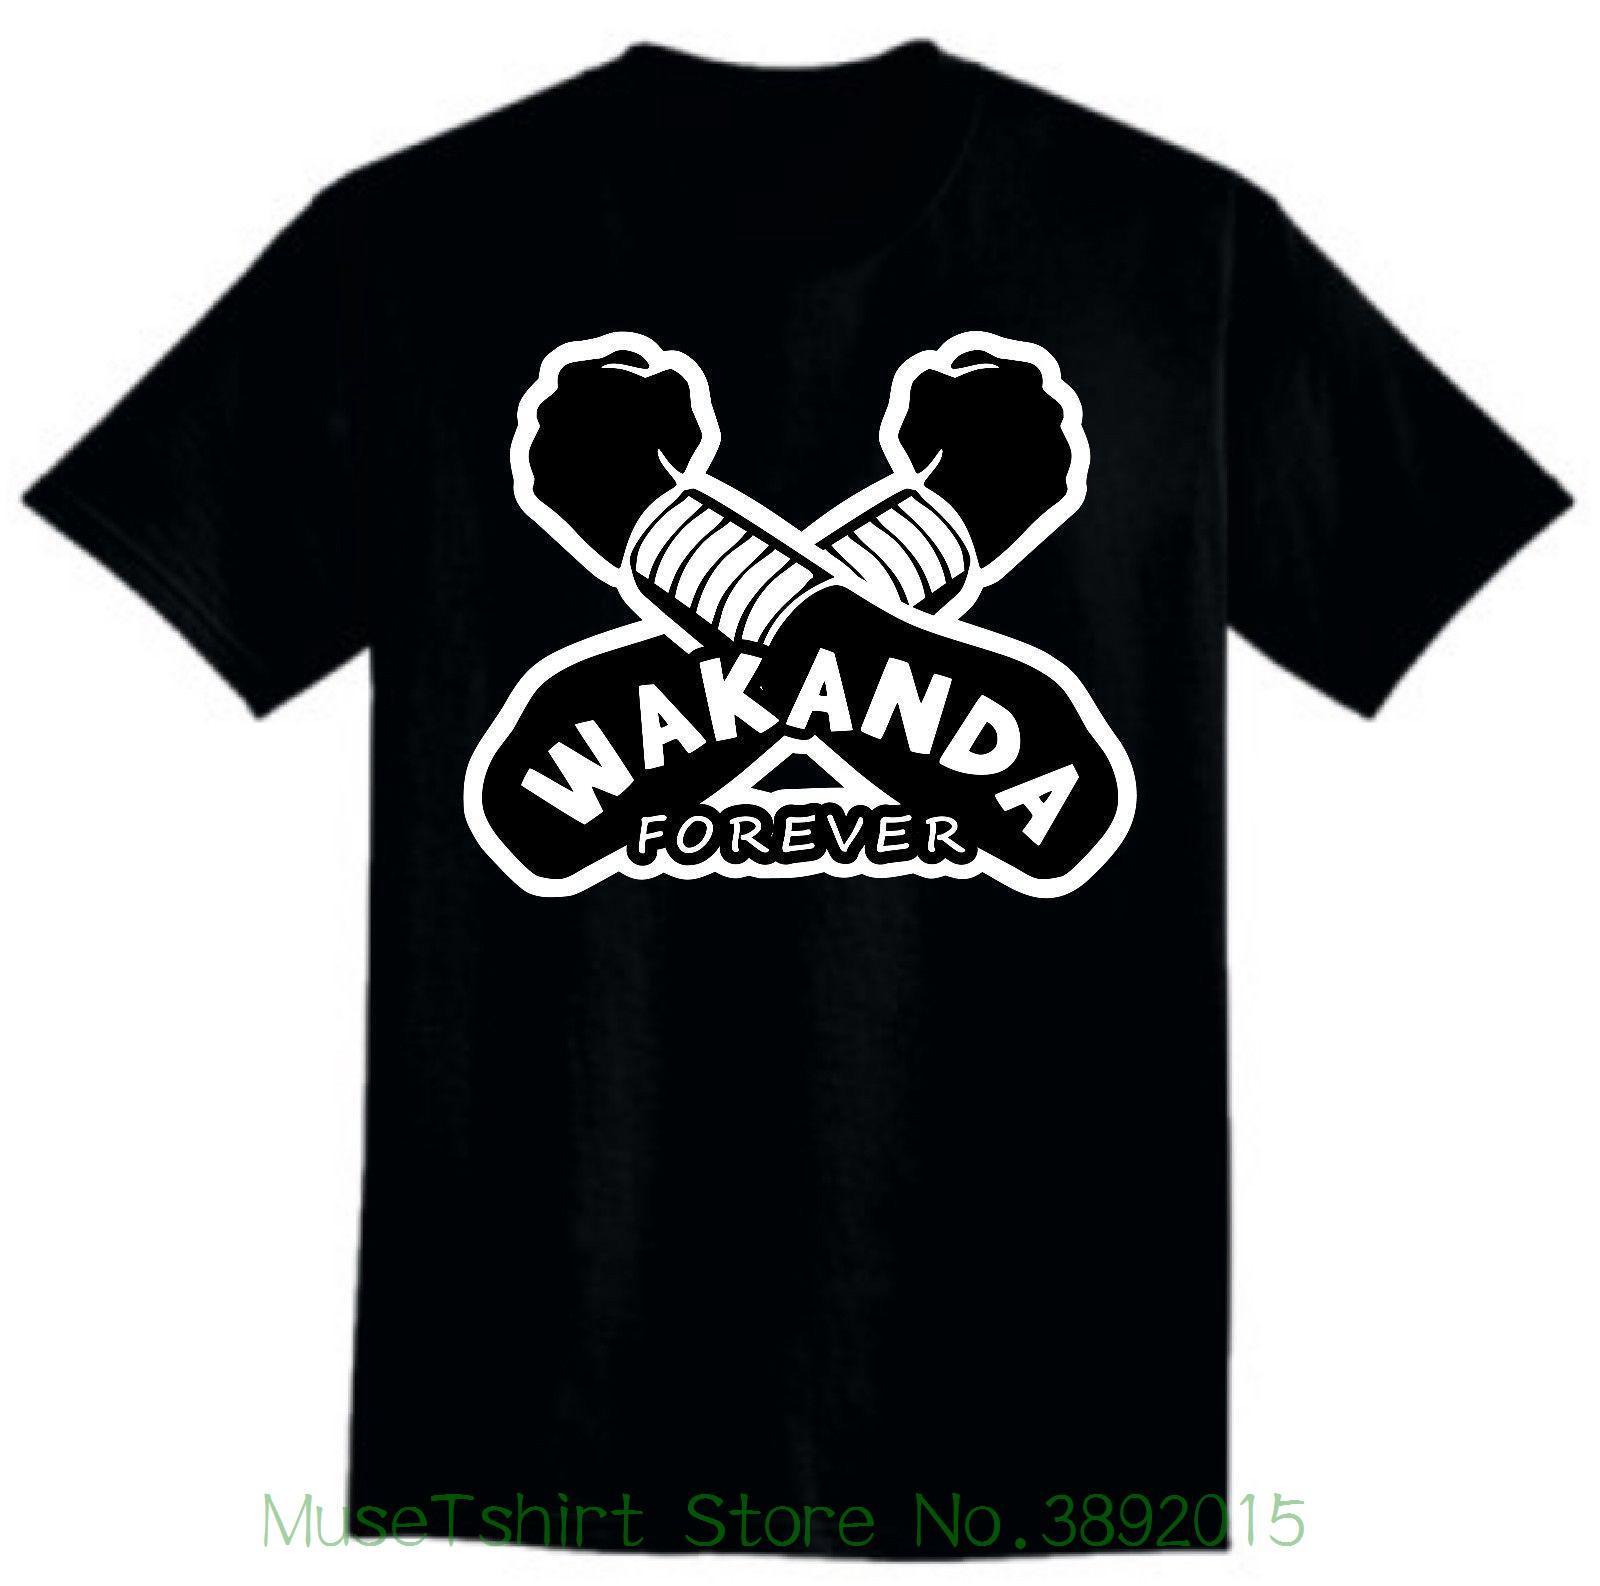 9c8240424 Straight Outta Wakanda T-shirt Wakanda , Black Panther Shirt Men Women Kid  Shirt Men New High Quality Online with $15.38/Piece on Musetshirtstore's  Store ...